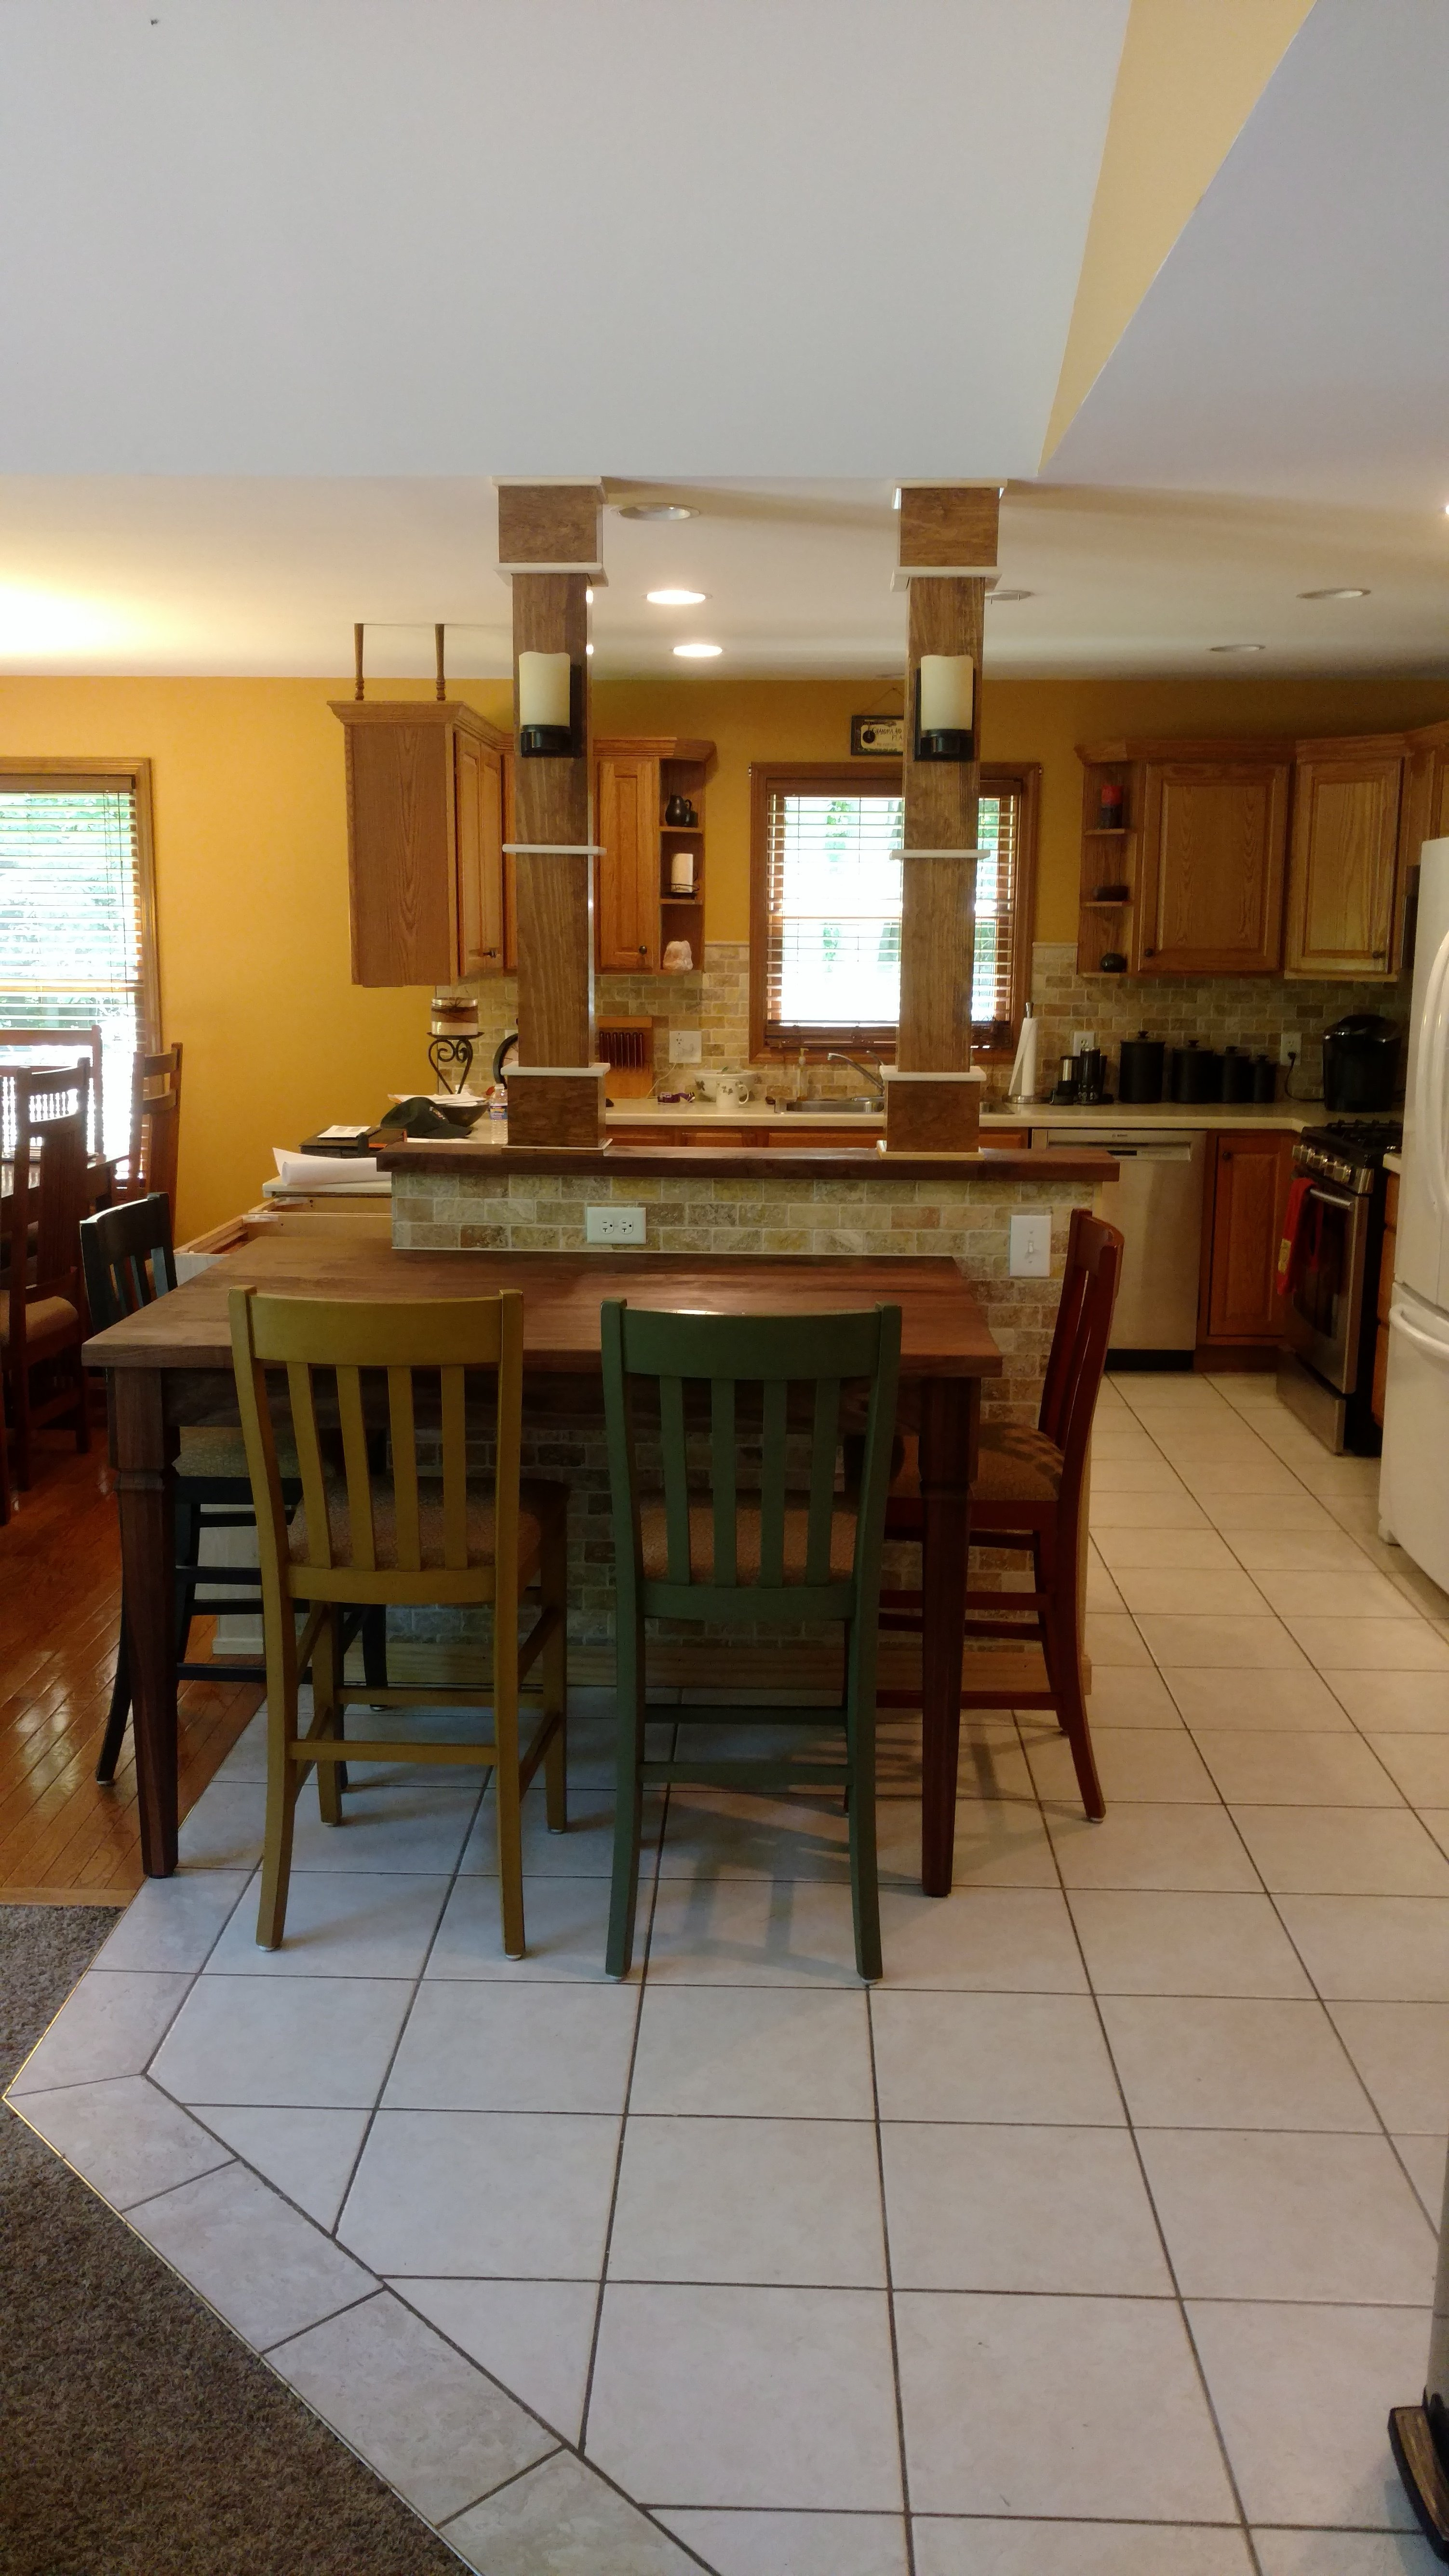 kitchen remodel chautauqua ny jamestown ny kitchen remodel jamestown ny